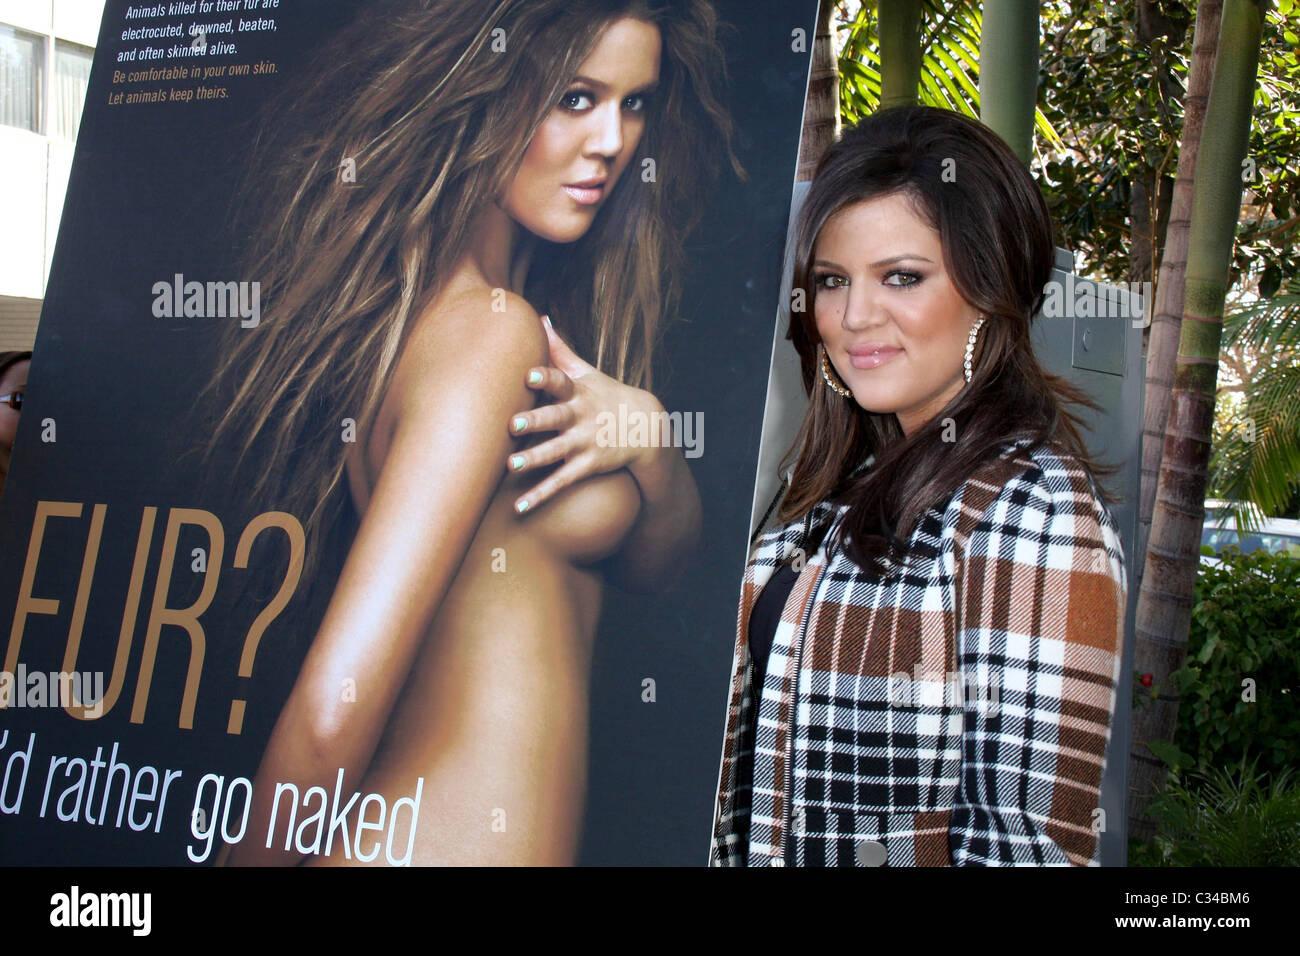 khloe-kardashian-id-rather-go-nude